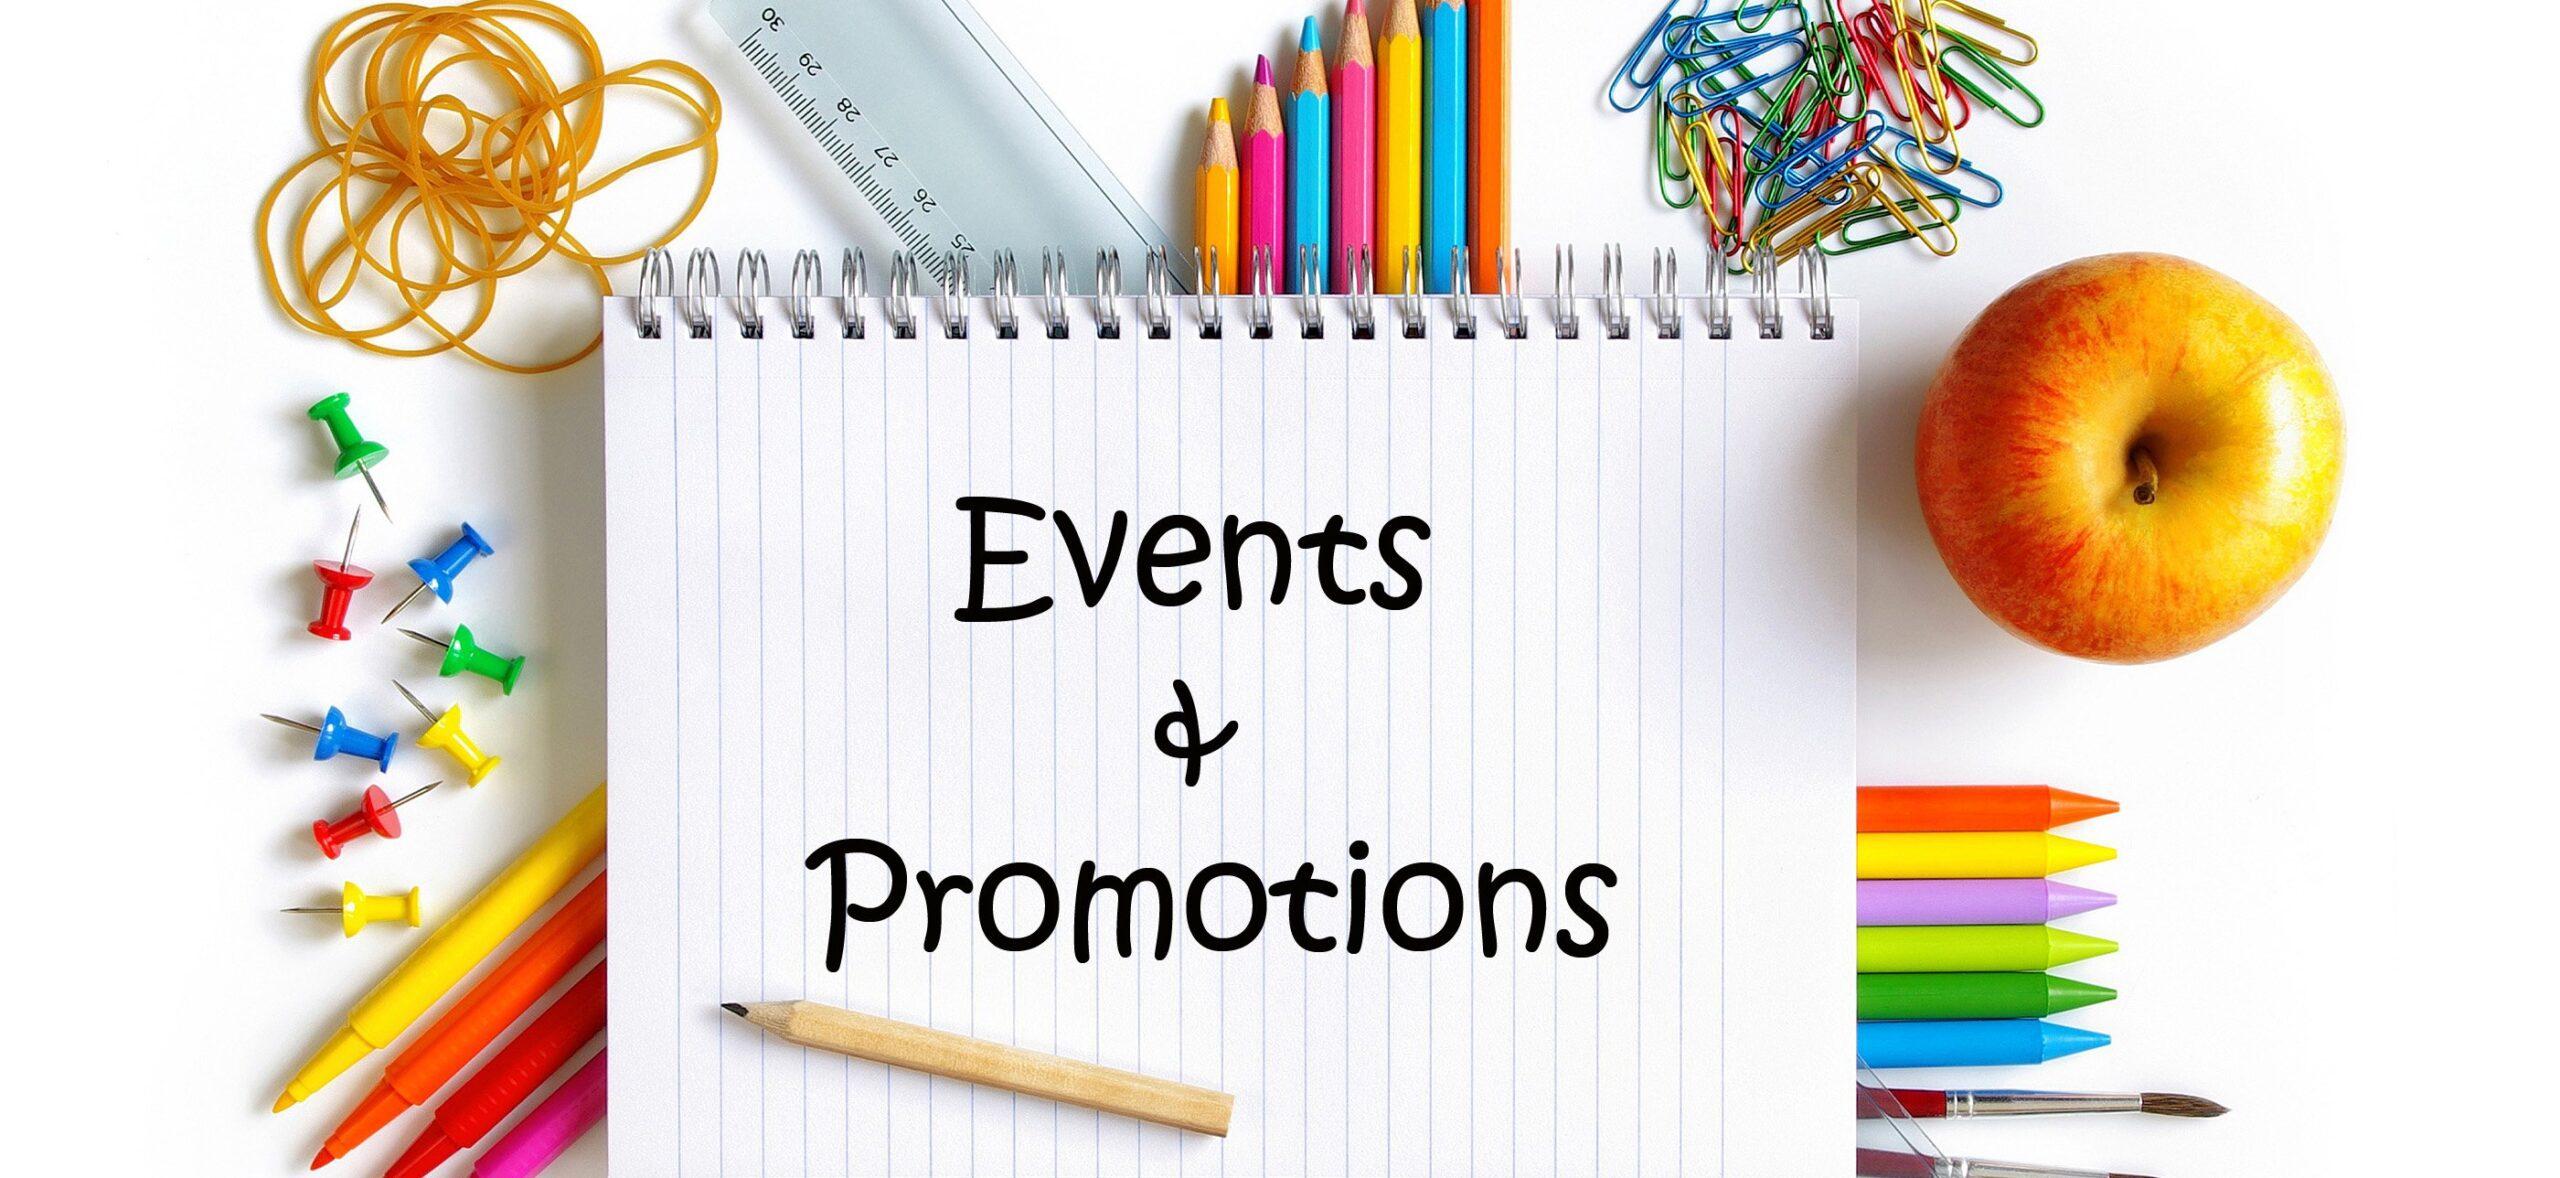 Event and Promotional Website Development in Bhubaneswar